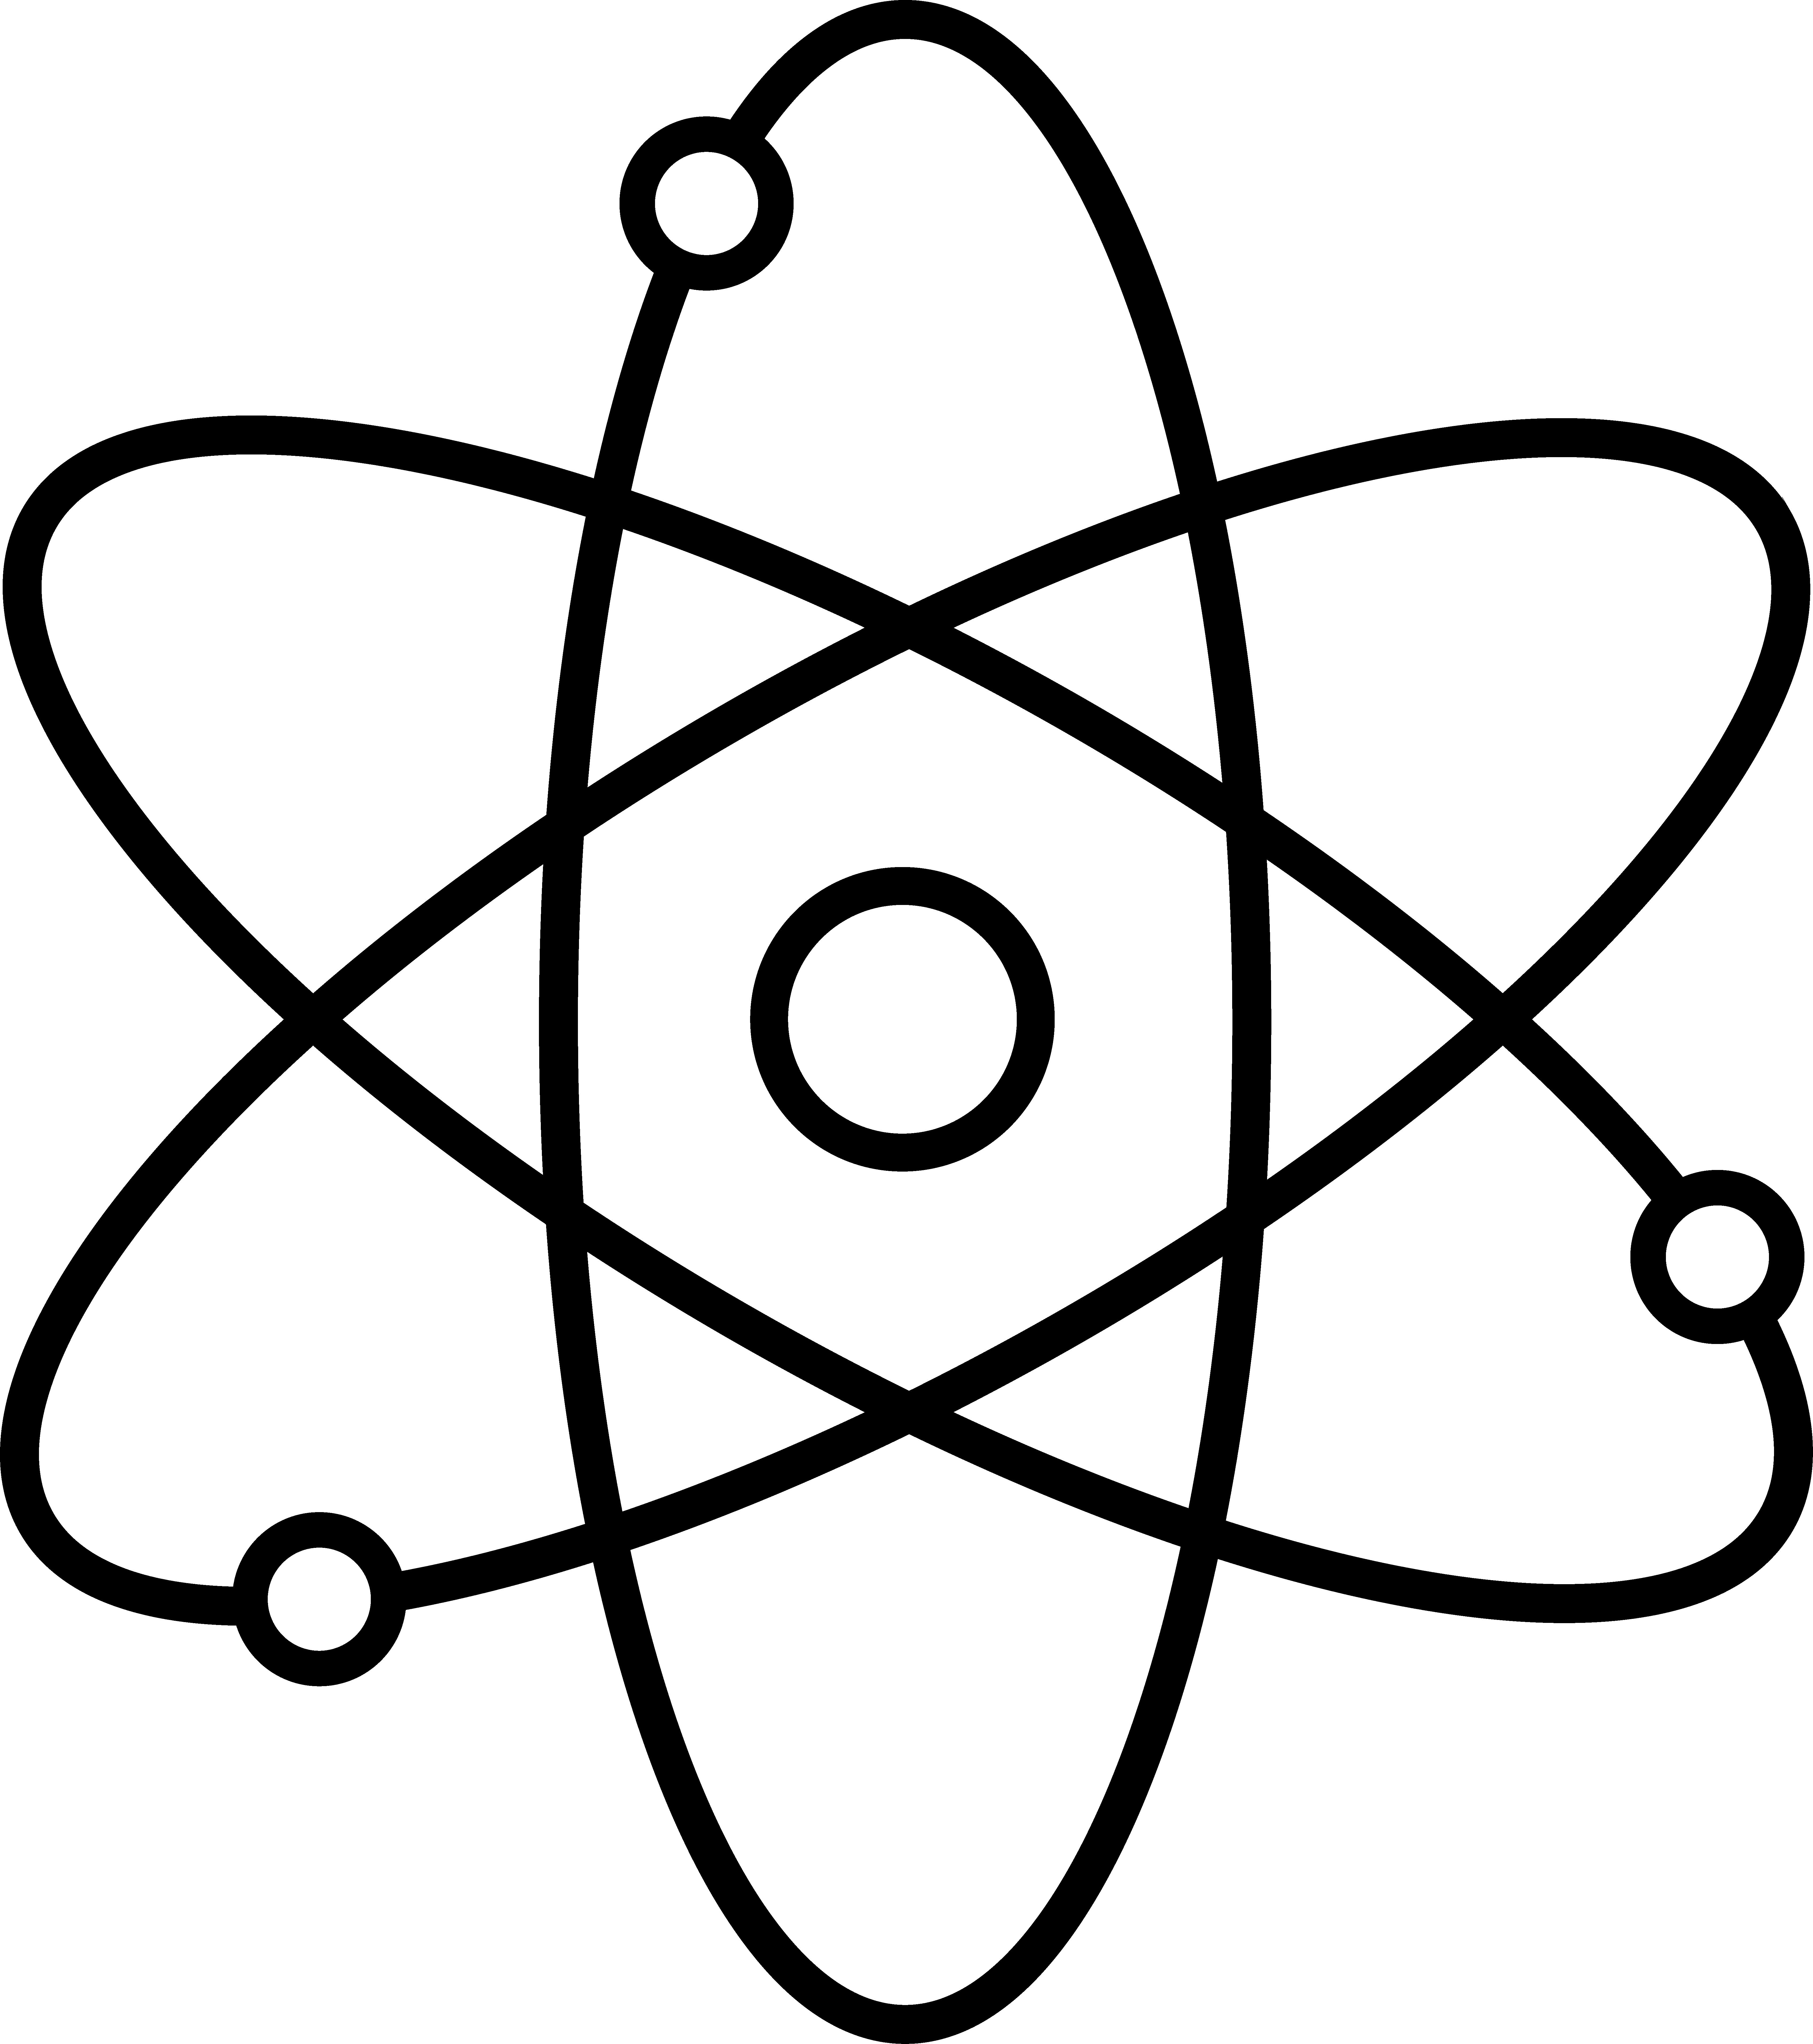 Nuts clipart outline. Atom symbol